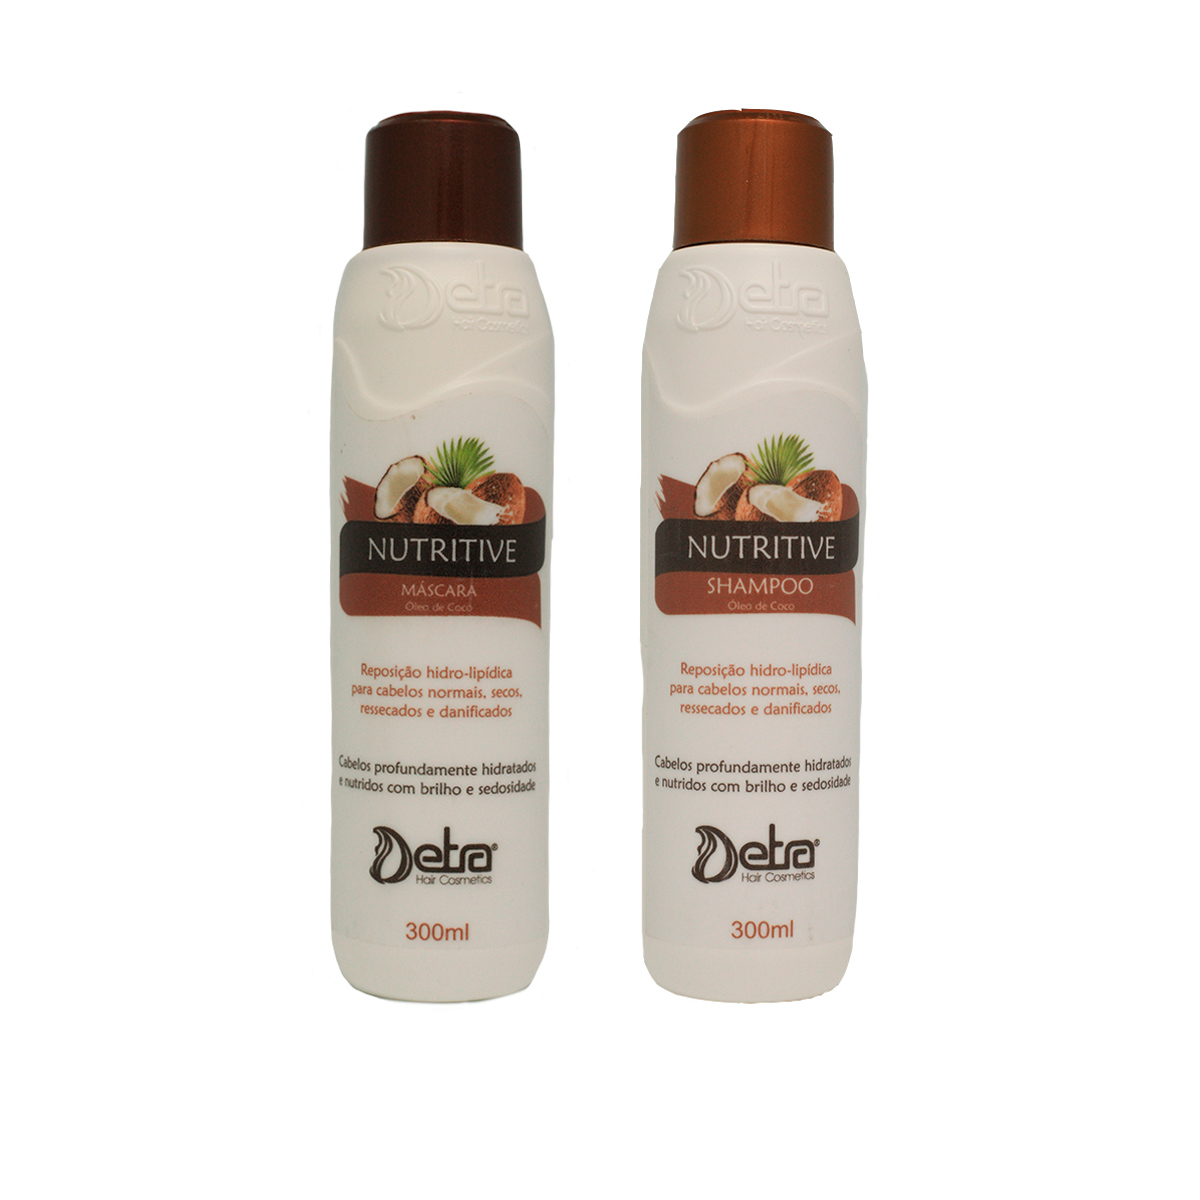 Detra Hair Cosmeticos Shampoo e Mascara Capilar  Nutritive Coco Kit